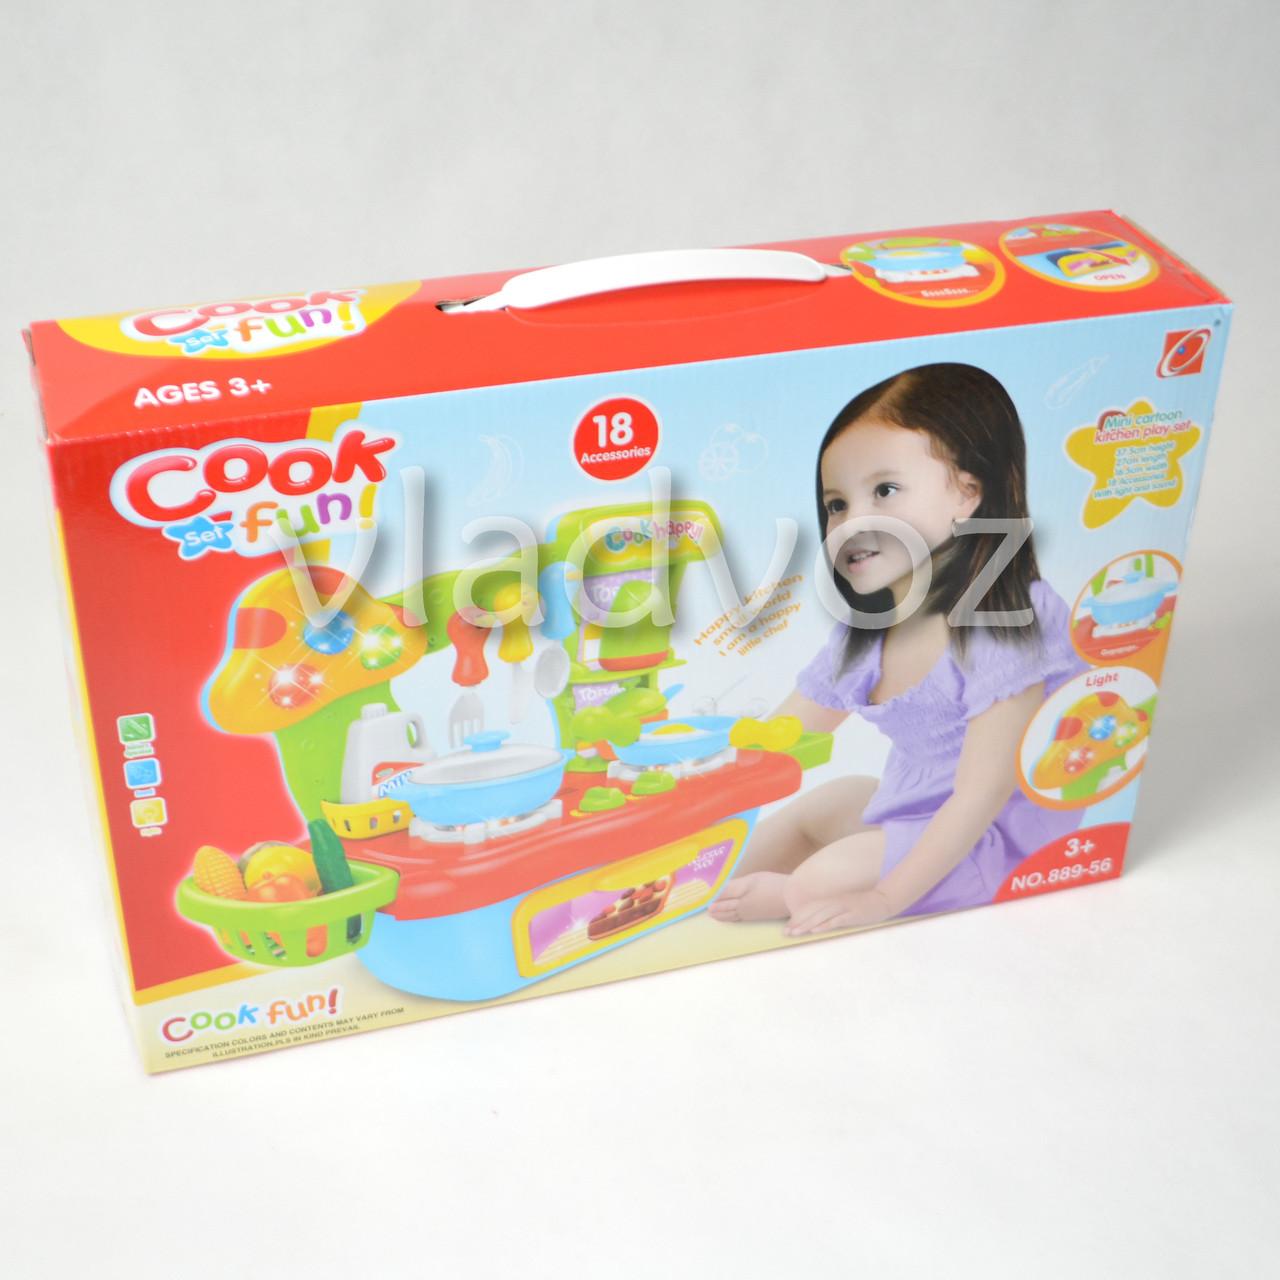 фото коробки детской пластиковой кухни для девочки, плита 2 камфорки голубая Cook fun mini